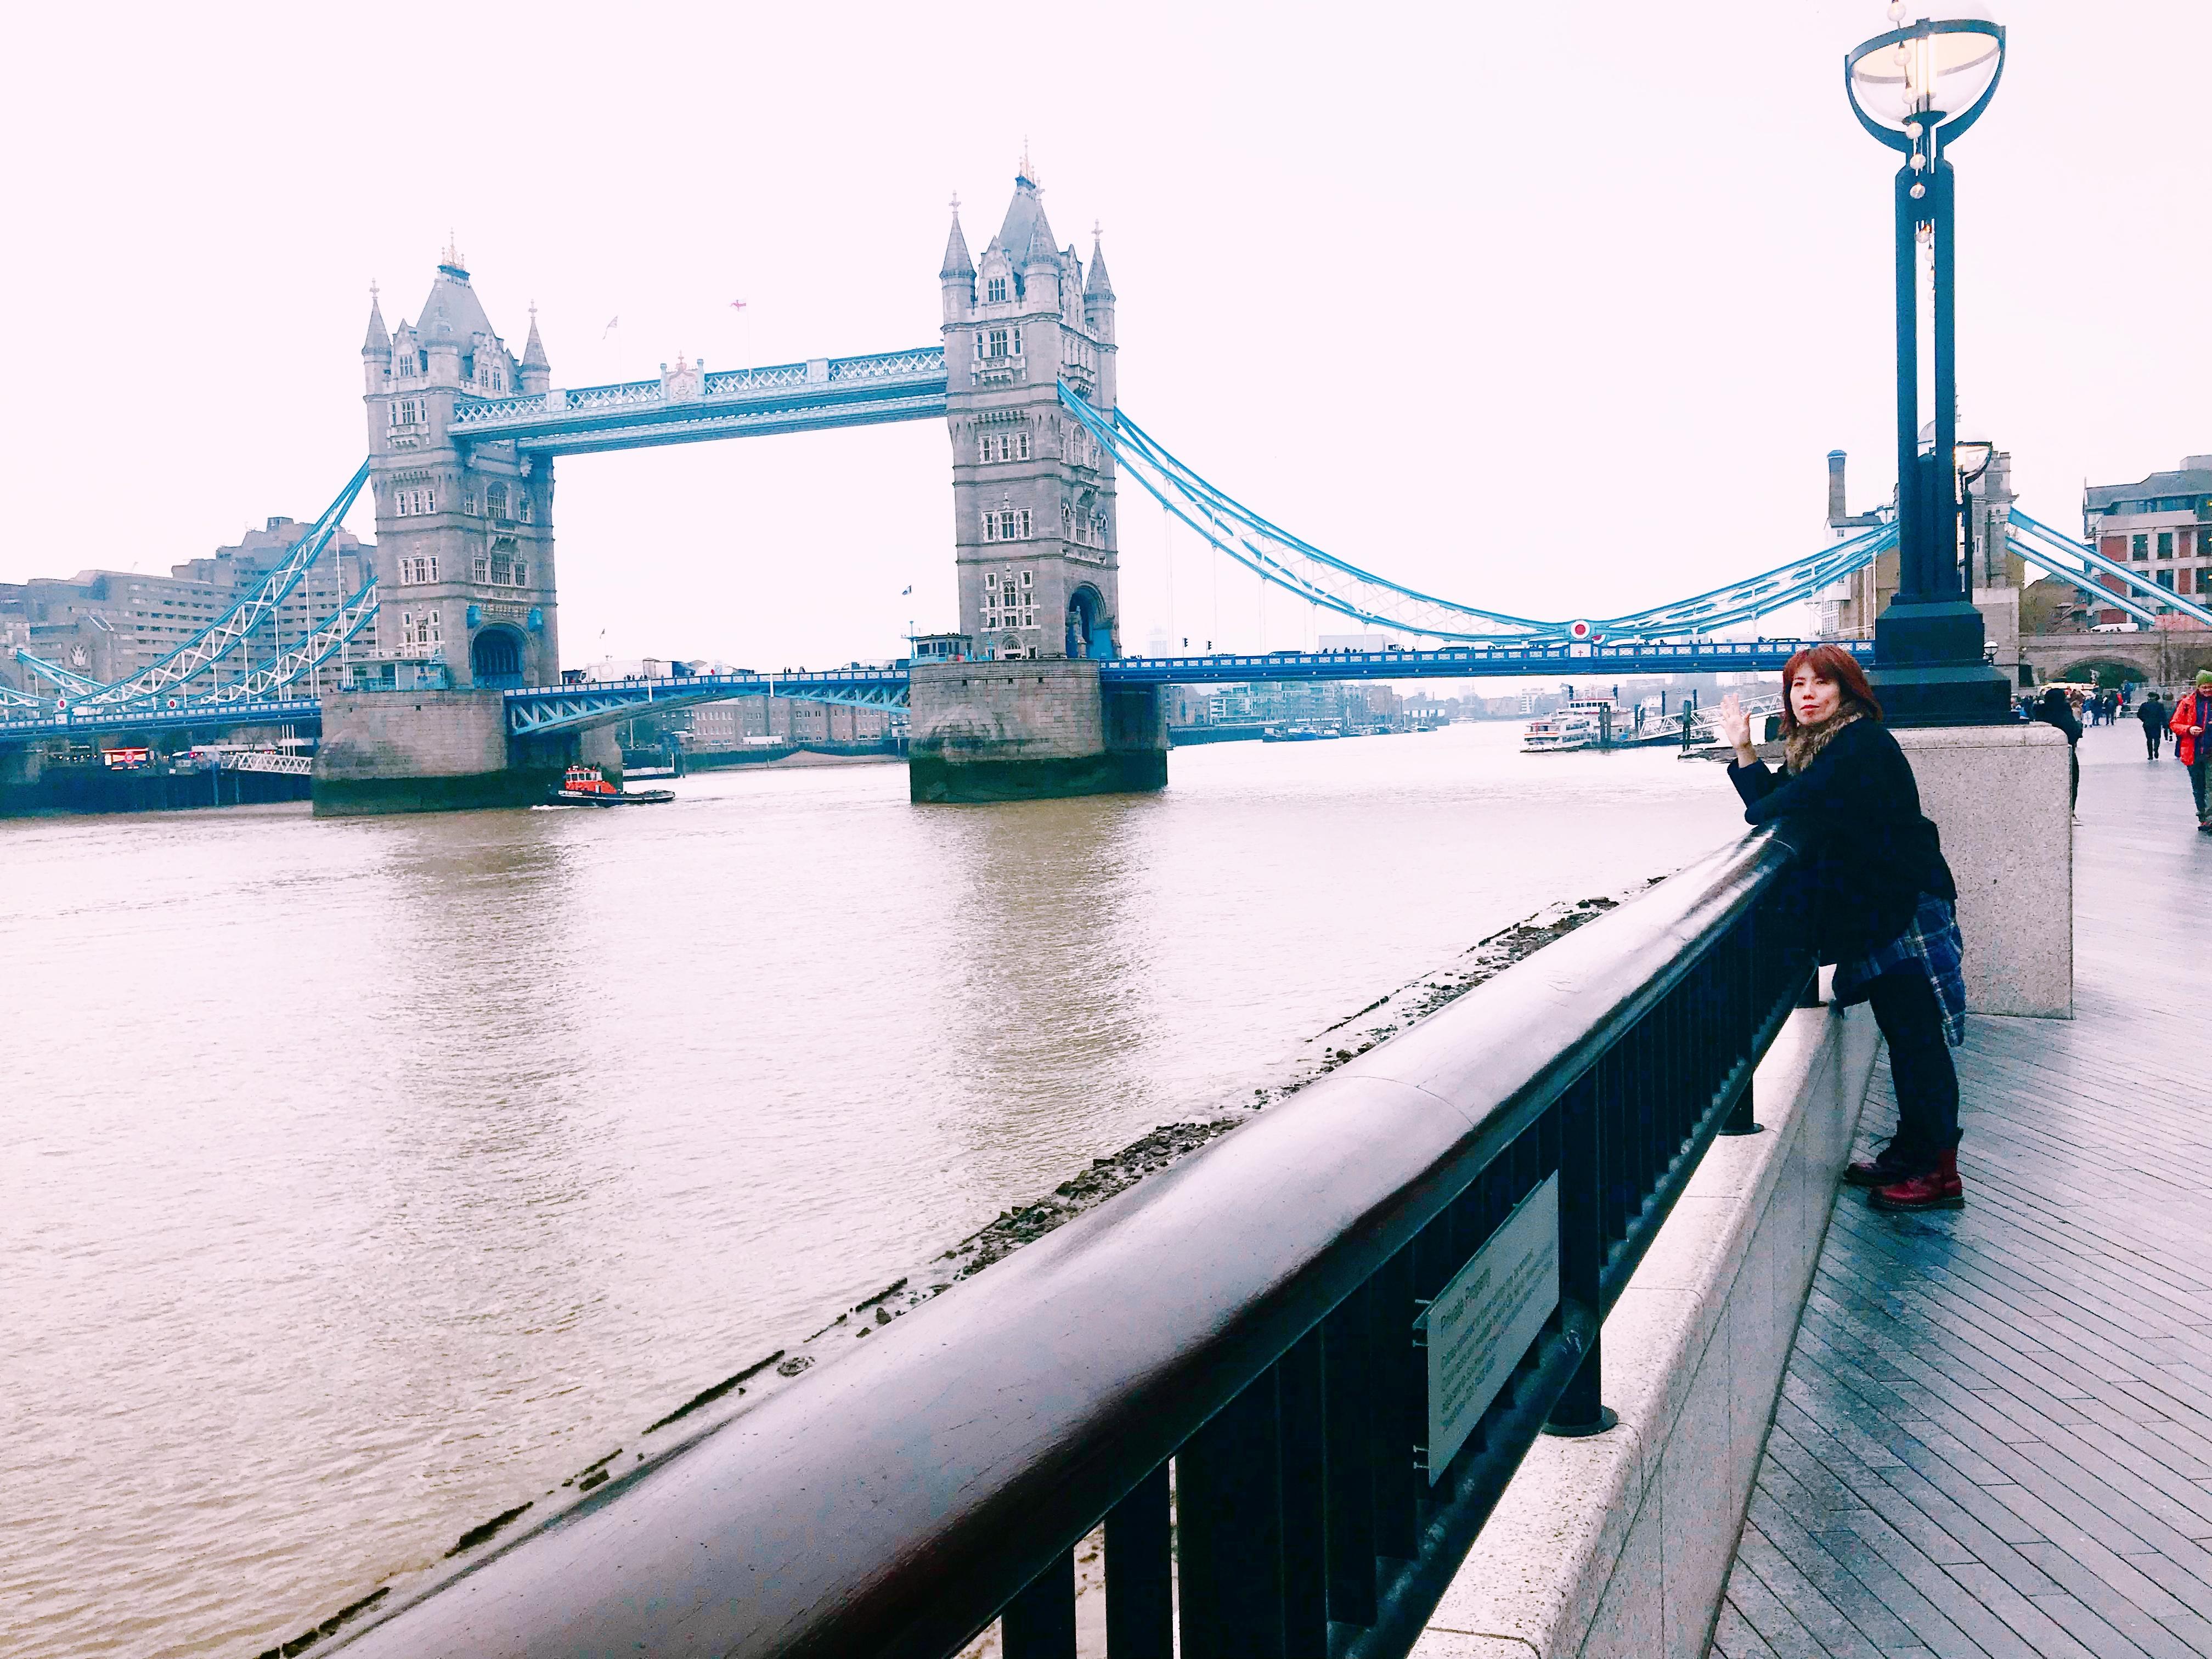 I am in London